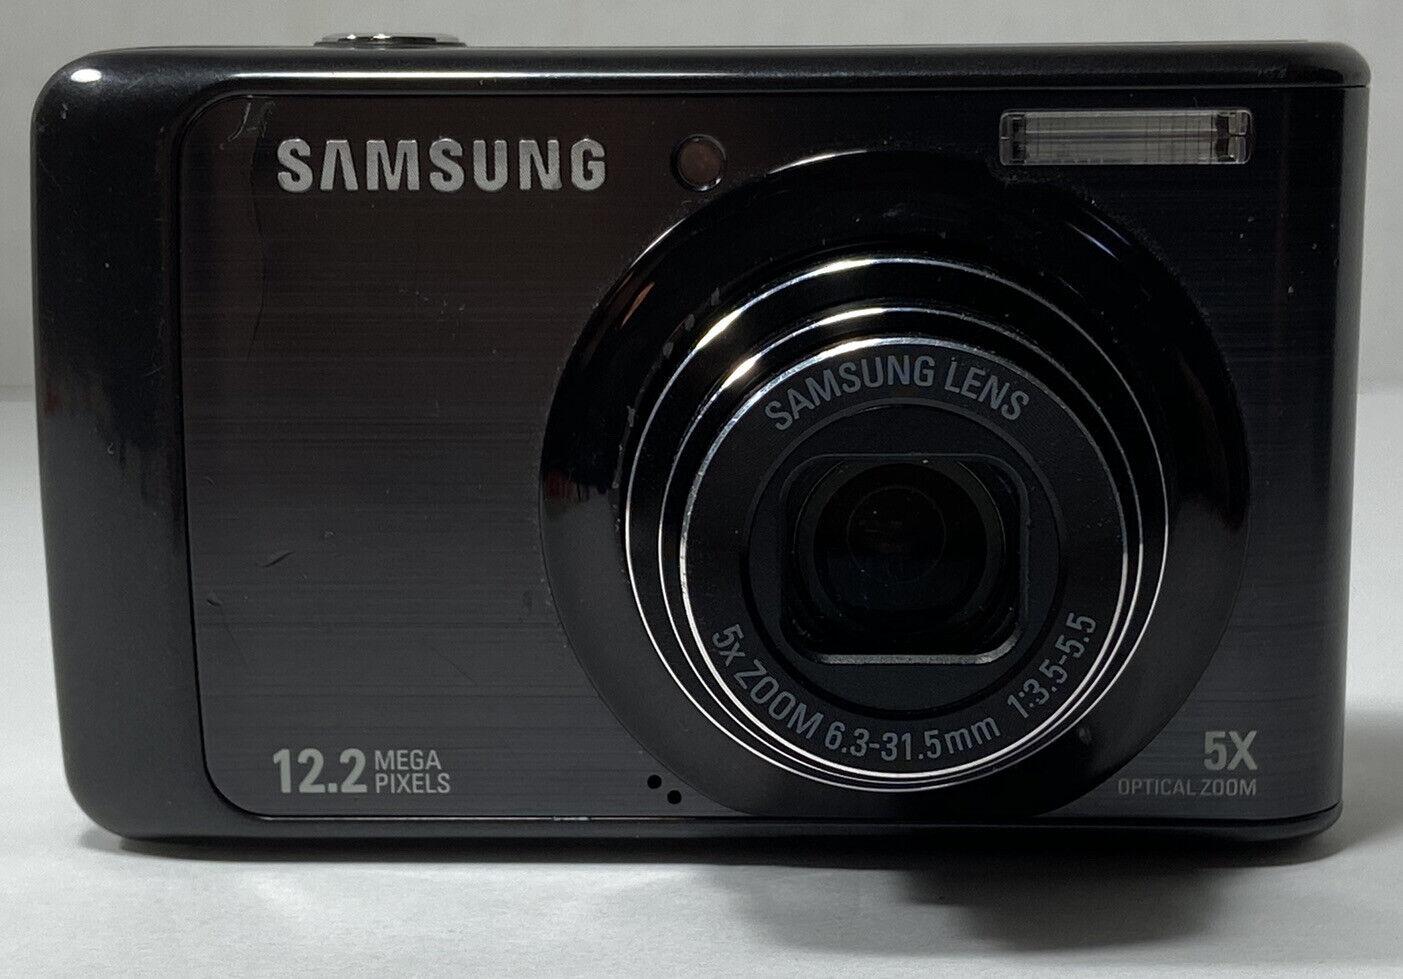 Memory Cards Samsung Digimax L50 Digital Camera Memory Card 2 x 8GB Secure Digital High Capacity 2 Pack SDHC